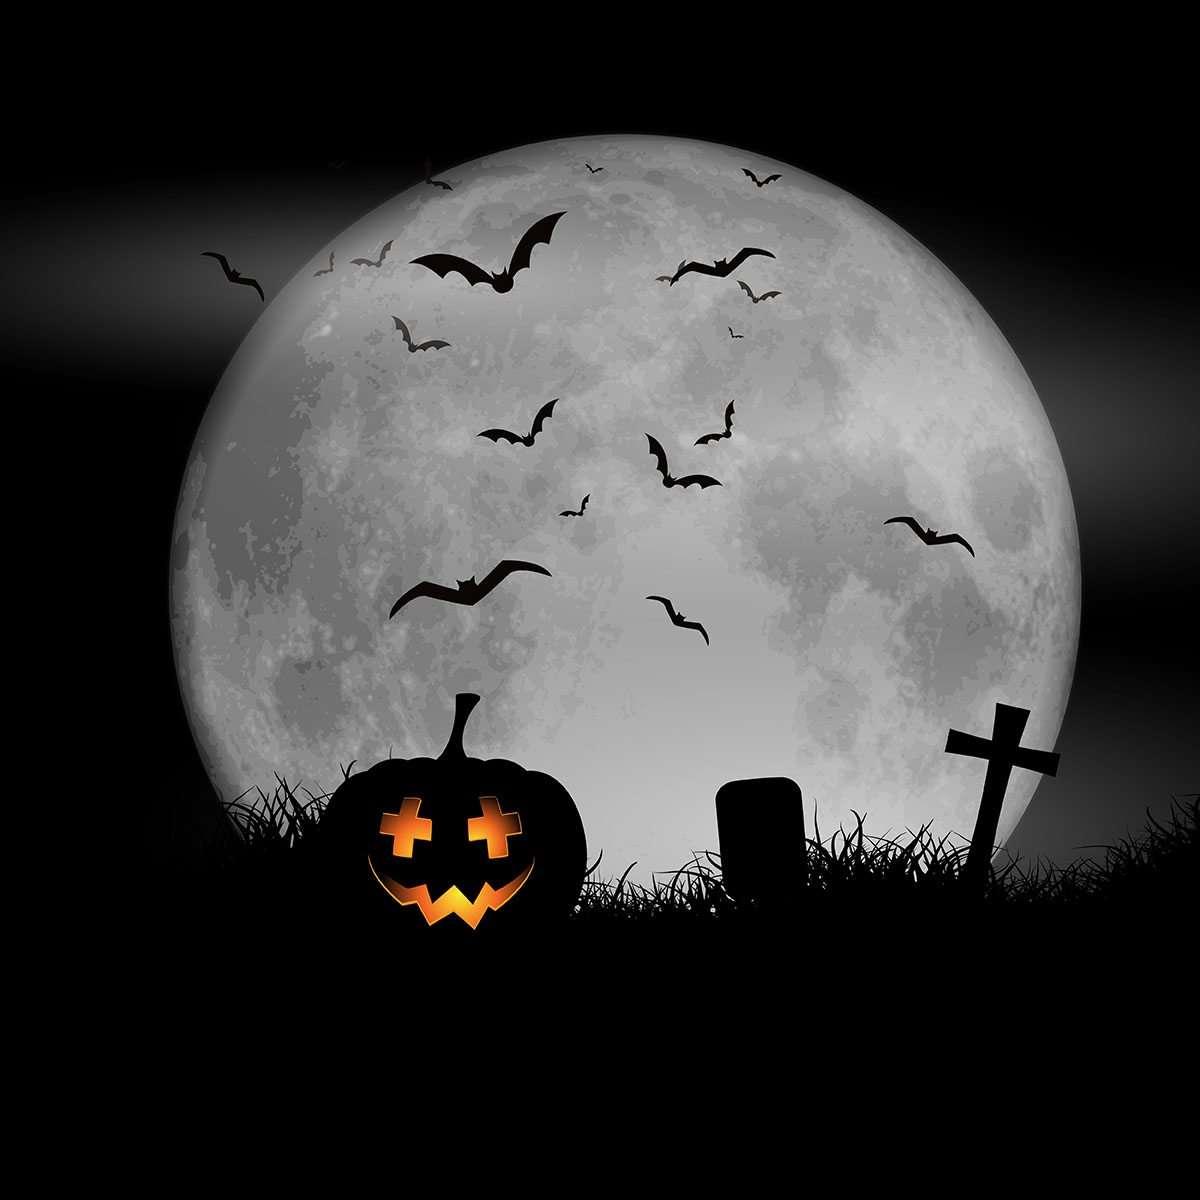 Halloween moon background